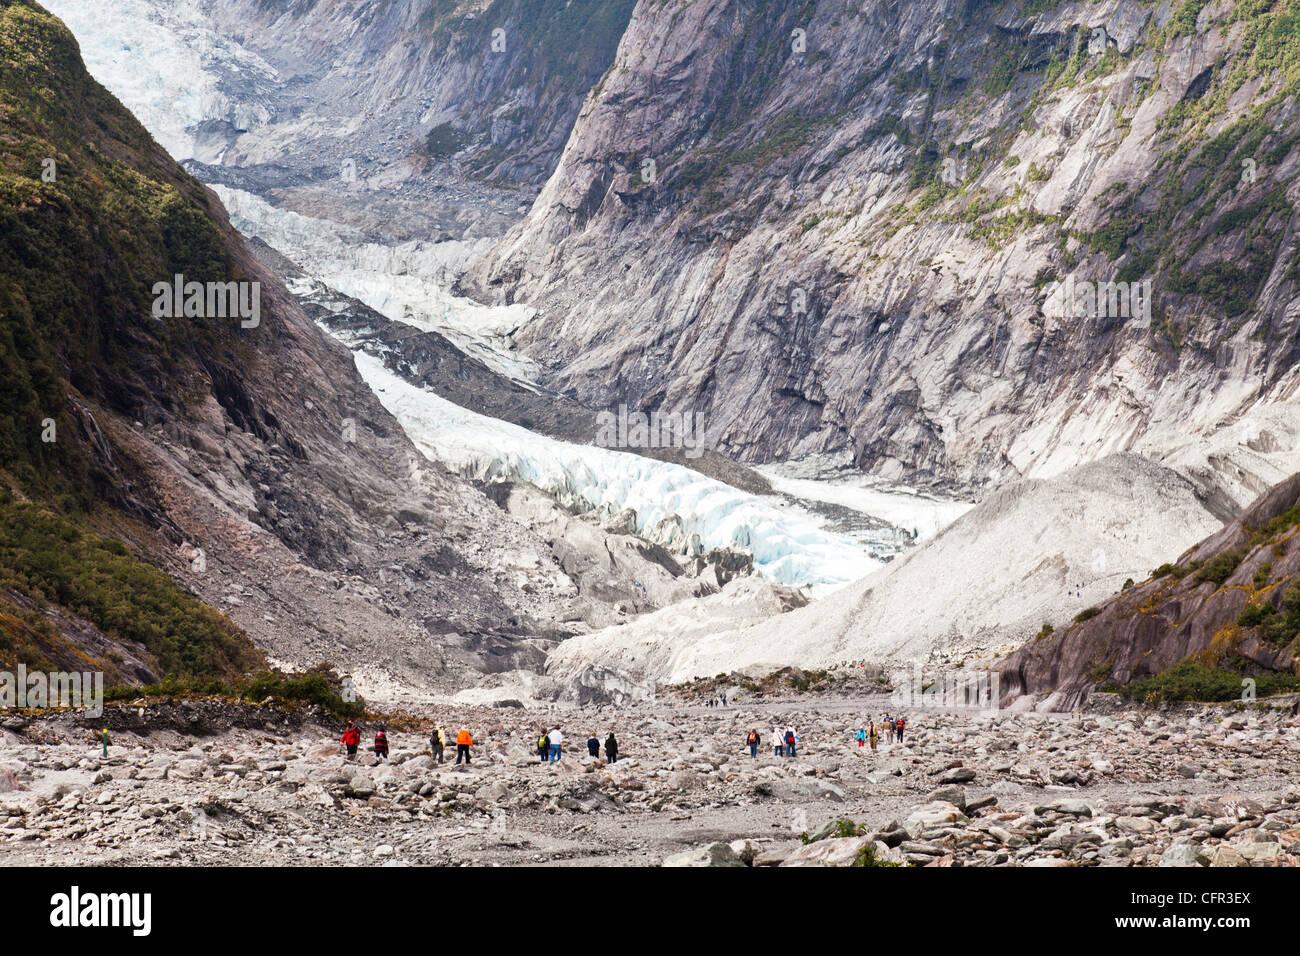 Tourists approaching the terminal of Franz Josef Glacier, West Coast, New Zealand - Stock Image